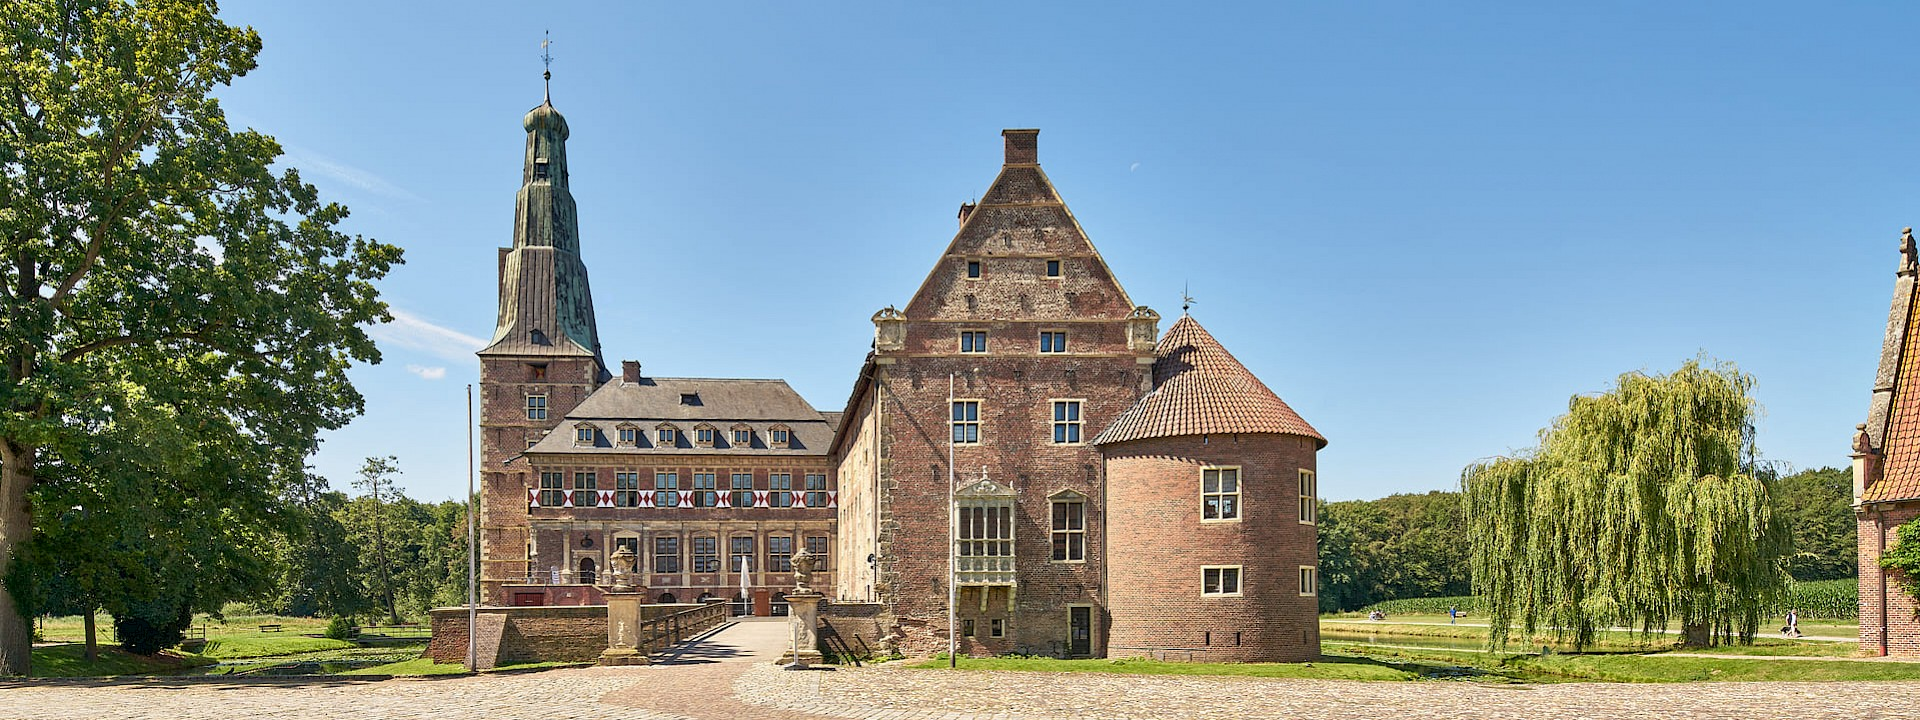 Ein harmonischer Dreiklang aus Schloss, Park und Ort Raesfeld